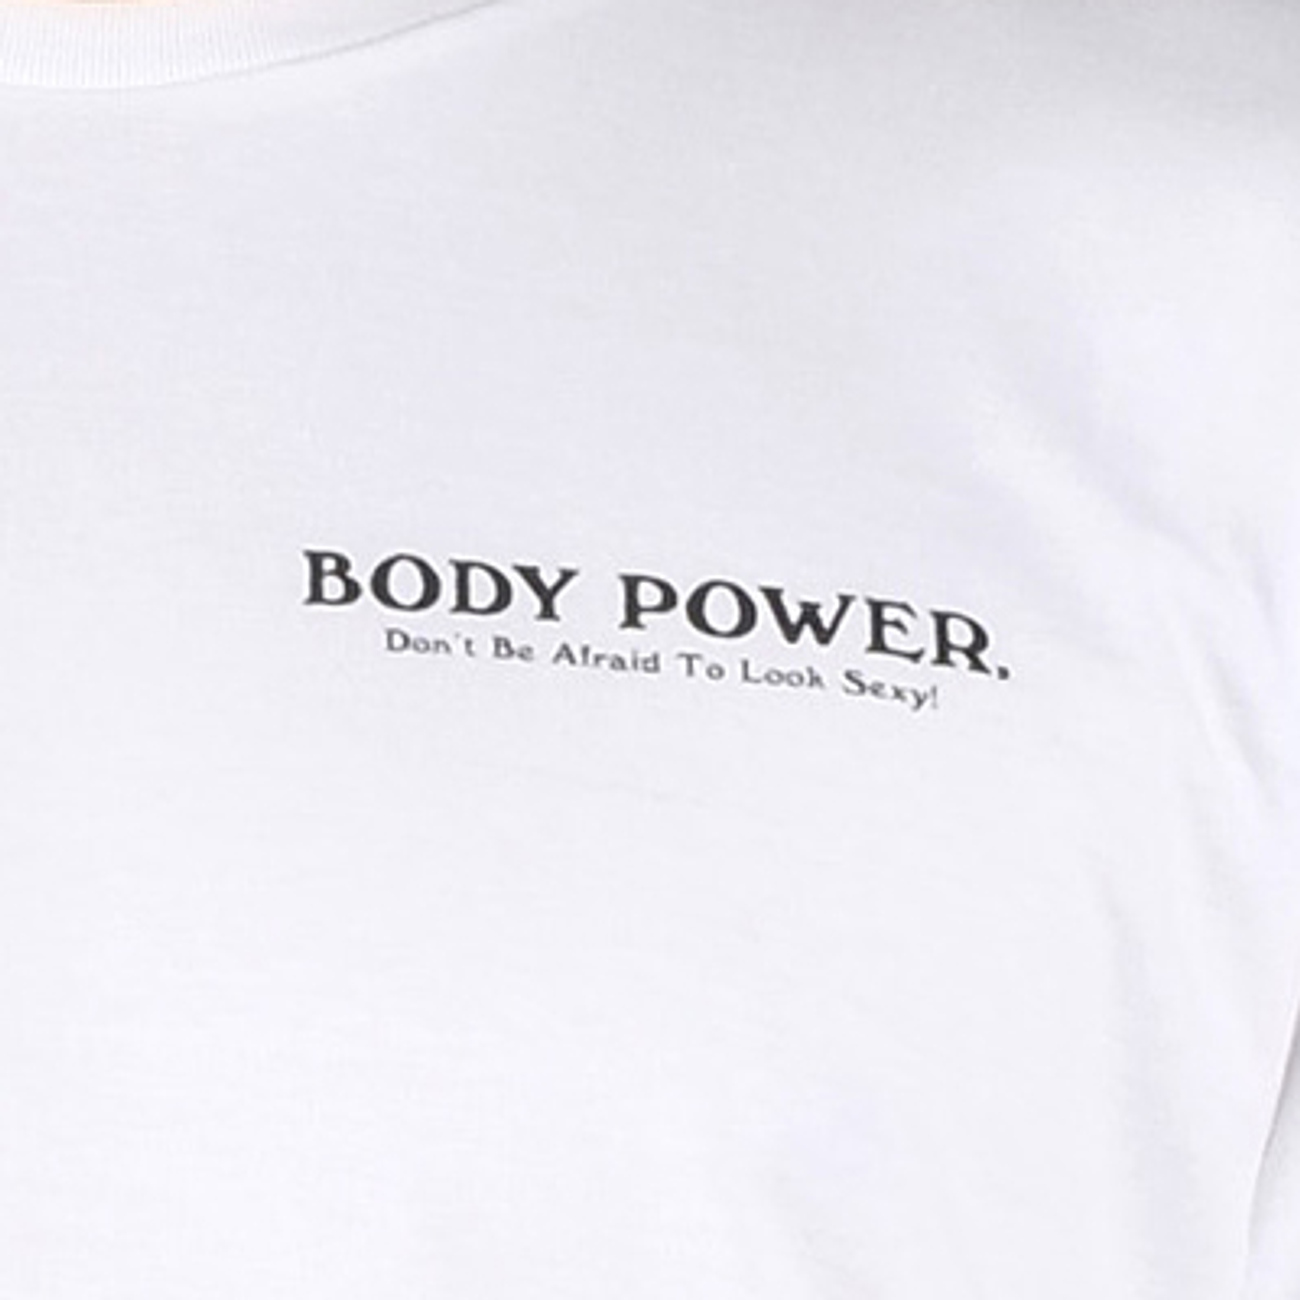 Body Power